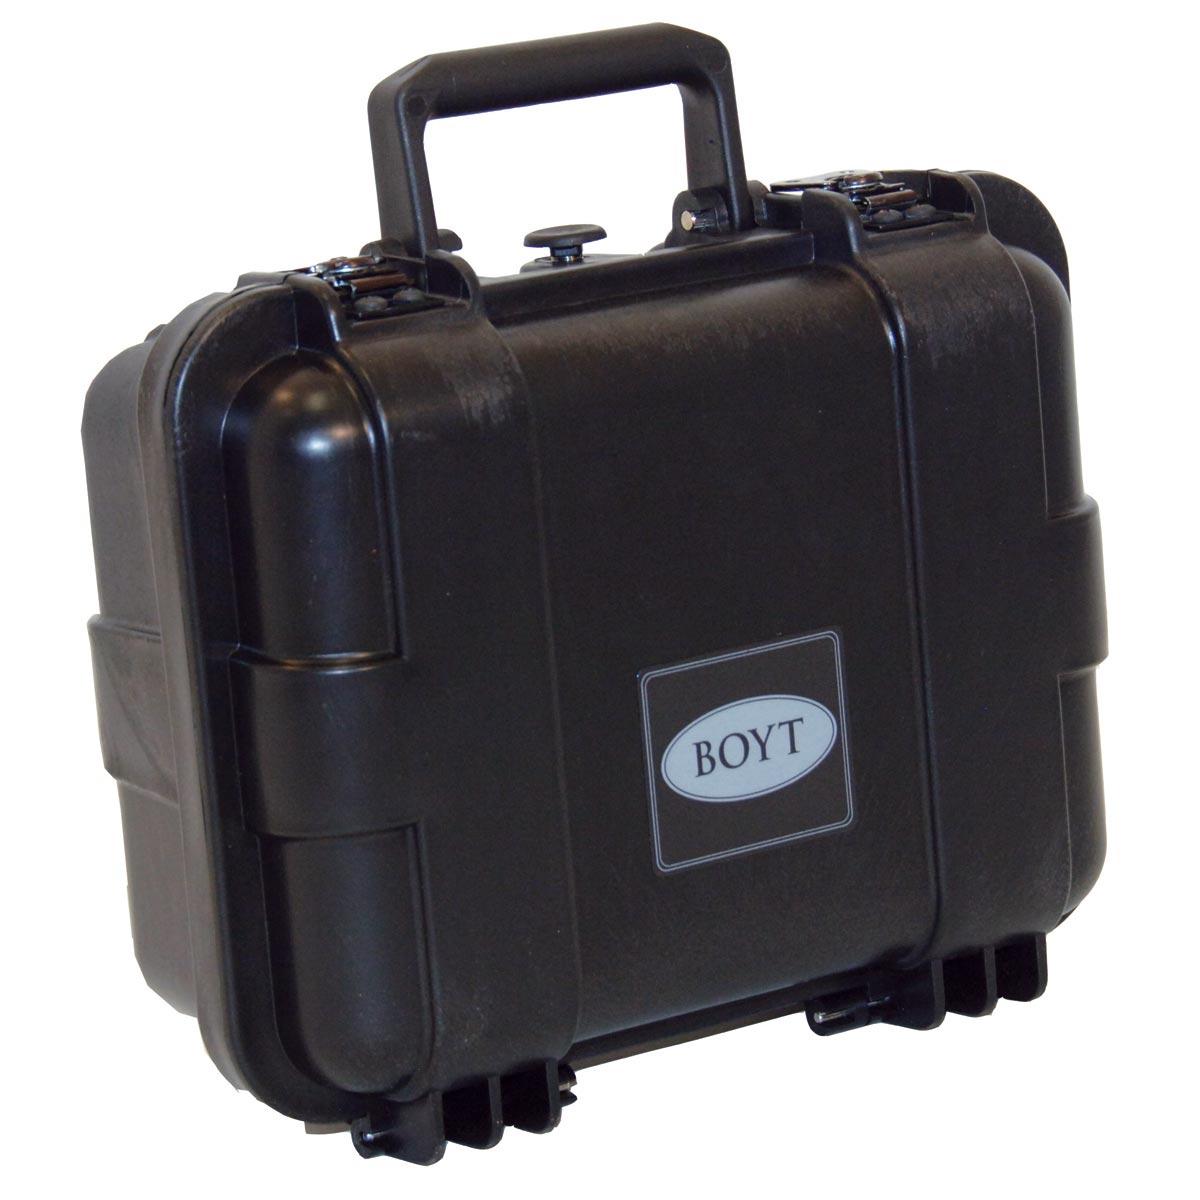 Boyt H-Series H11 Single Handgun/Accessory/Ammo Case